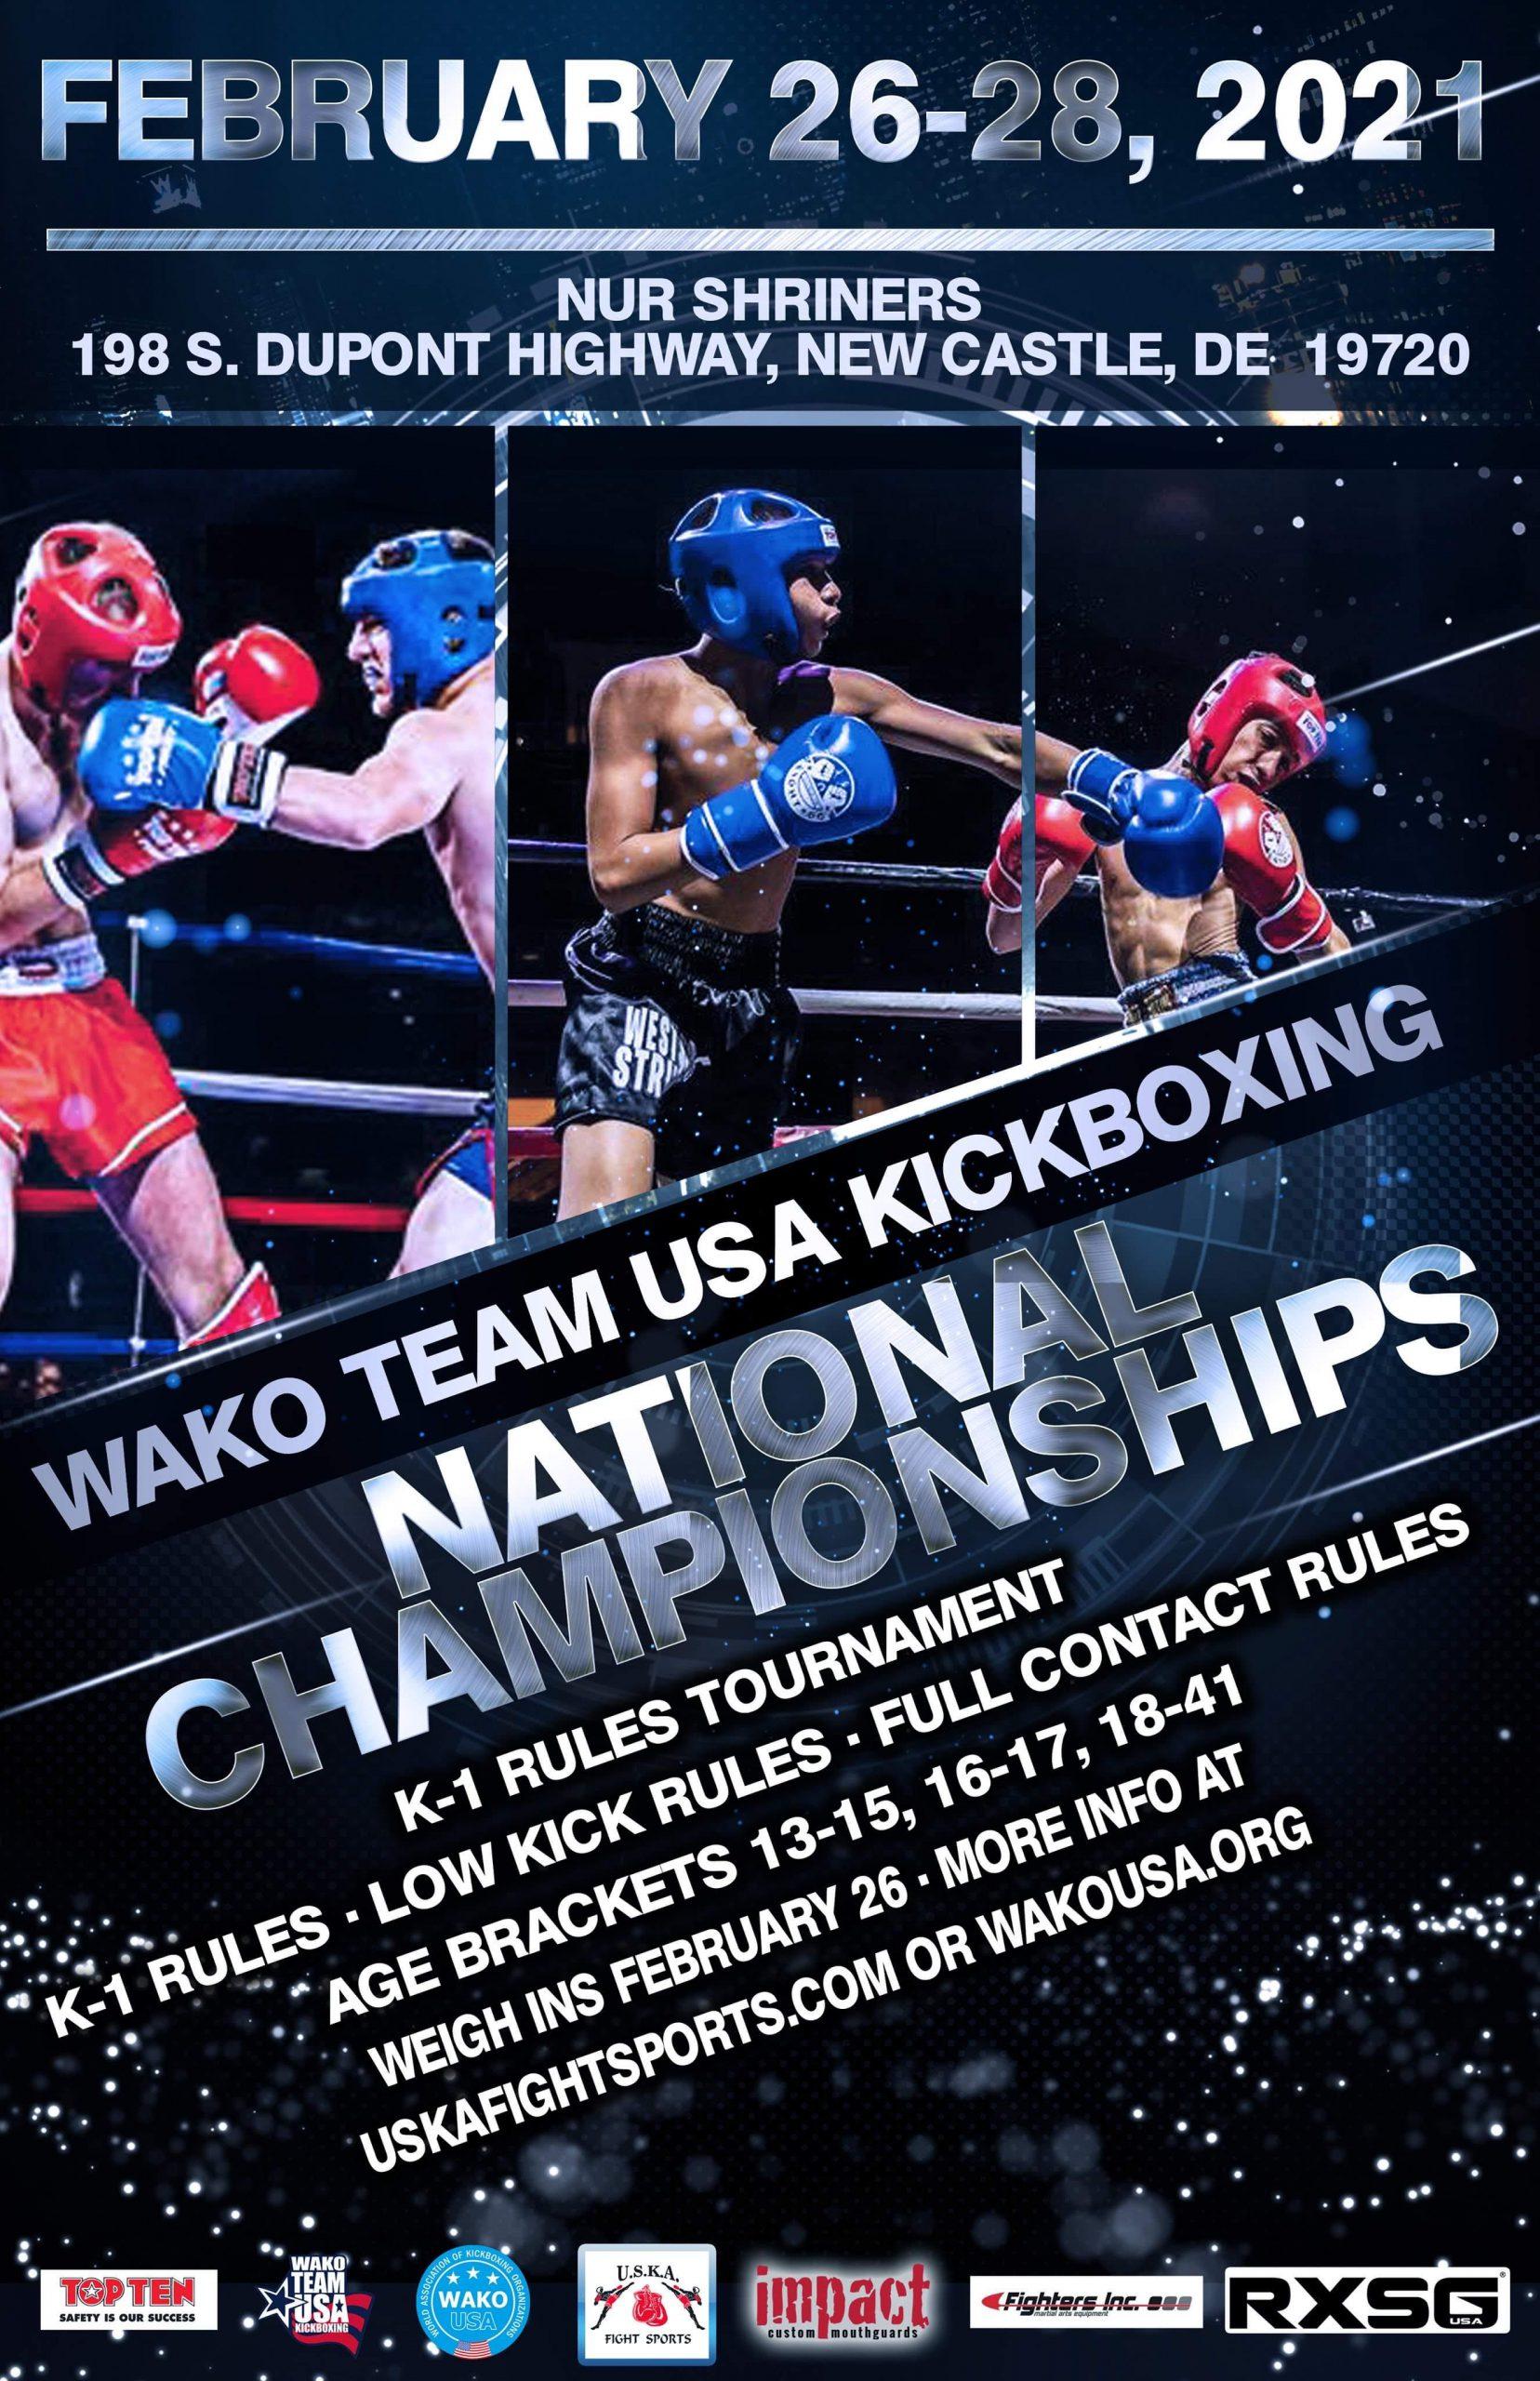 Feb 26 - 28, 2021 WAKO National Championship